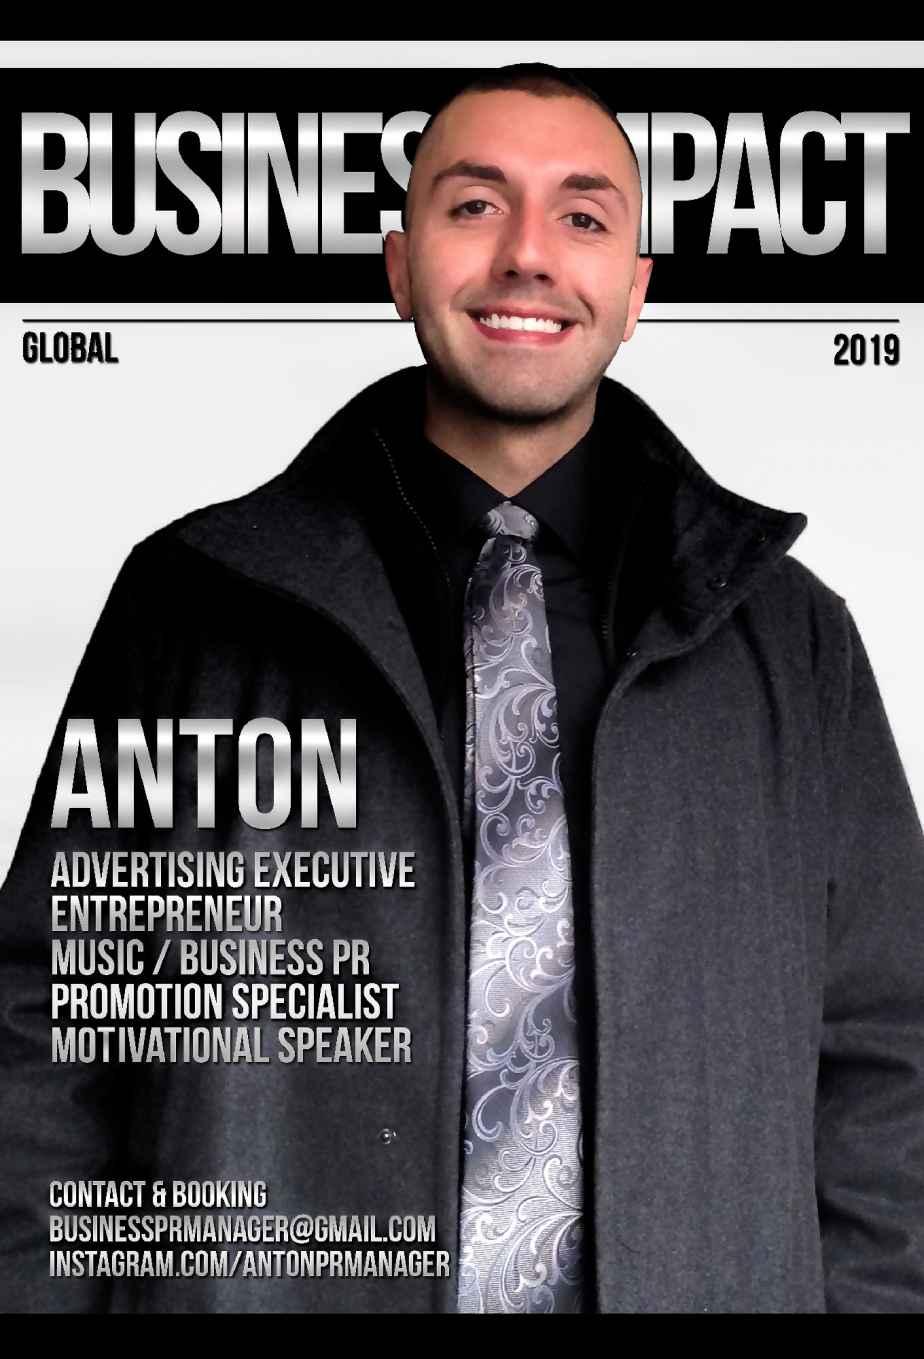 ANTON - BUSINESS IMPACT 2019